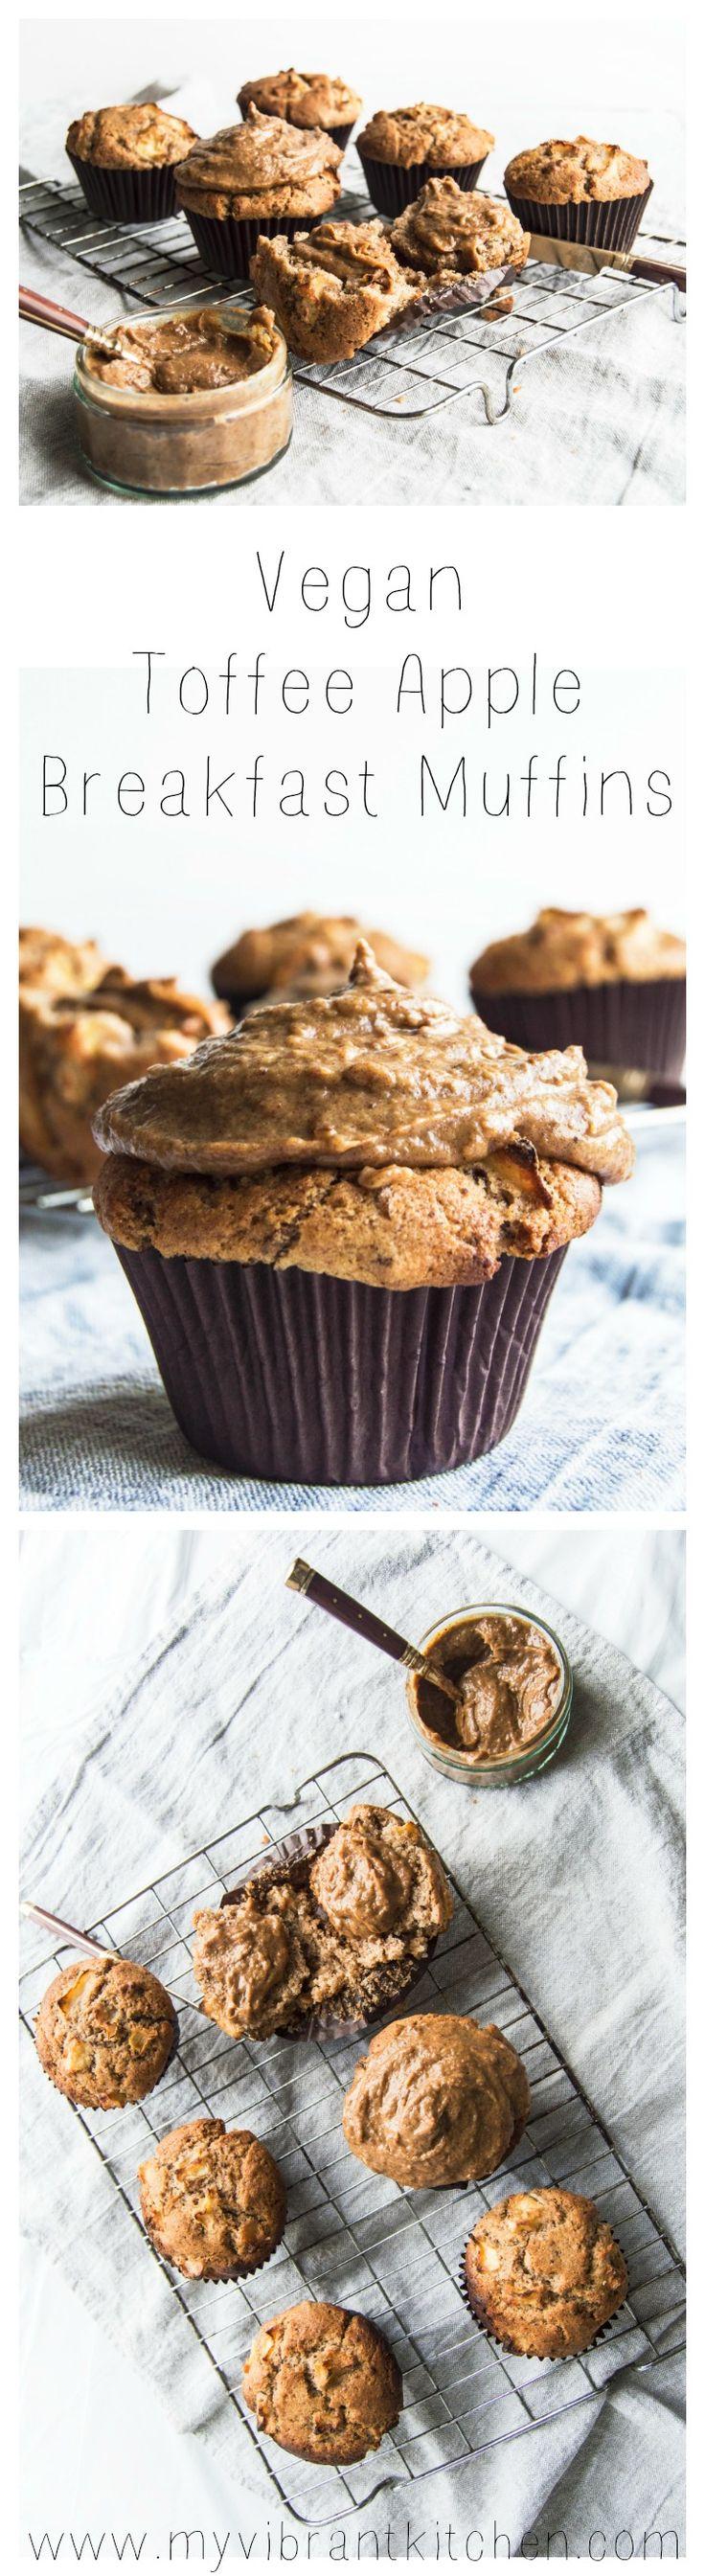 My Vibrant Kitchen   Vegan Toffee Apple Breakfast Muffins   myvibrantkitchen.com